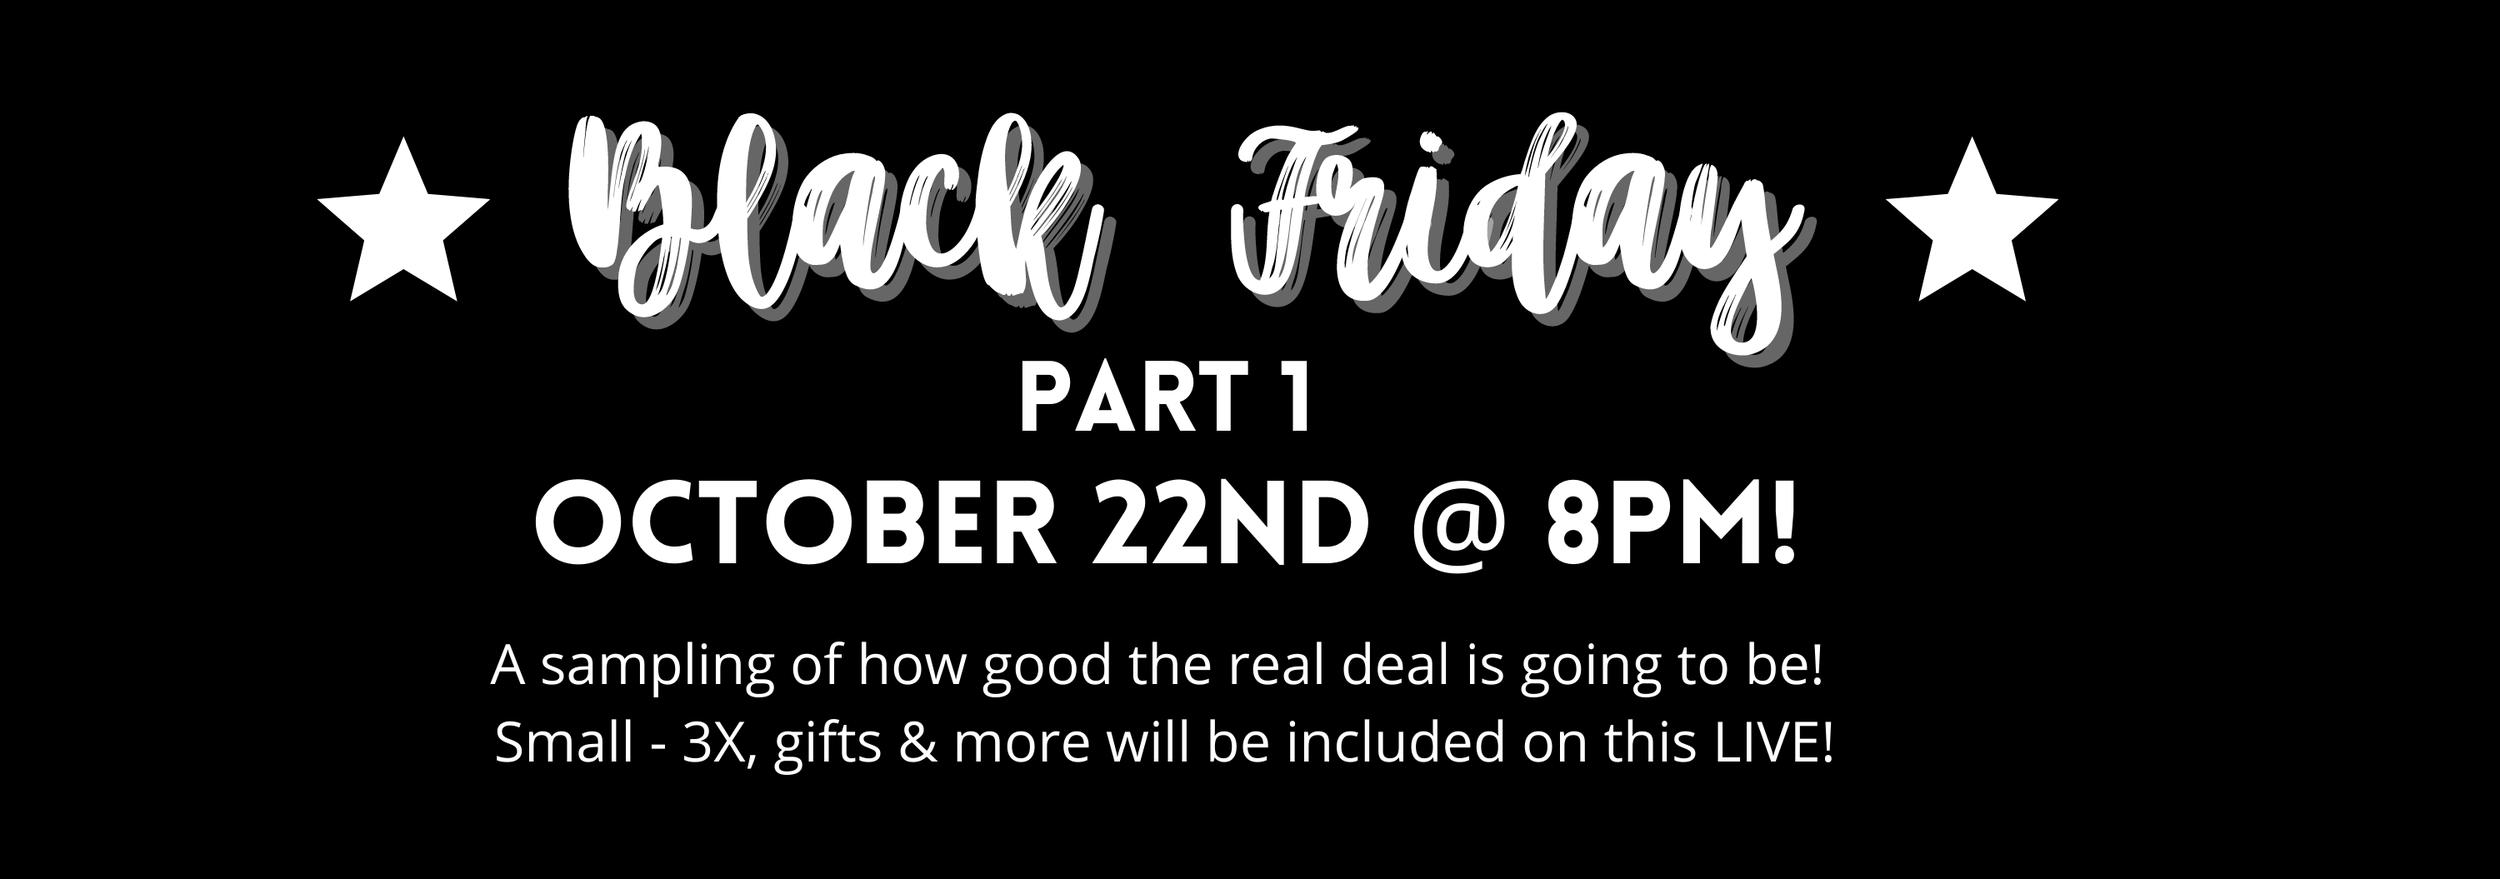 Black Friday part 1